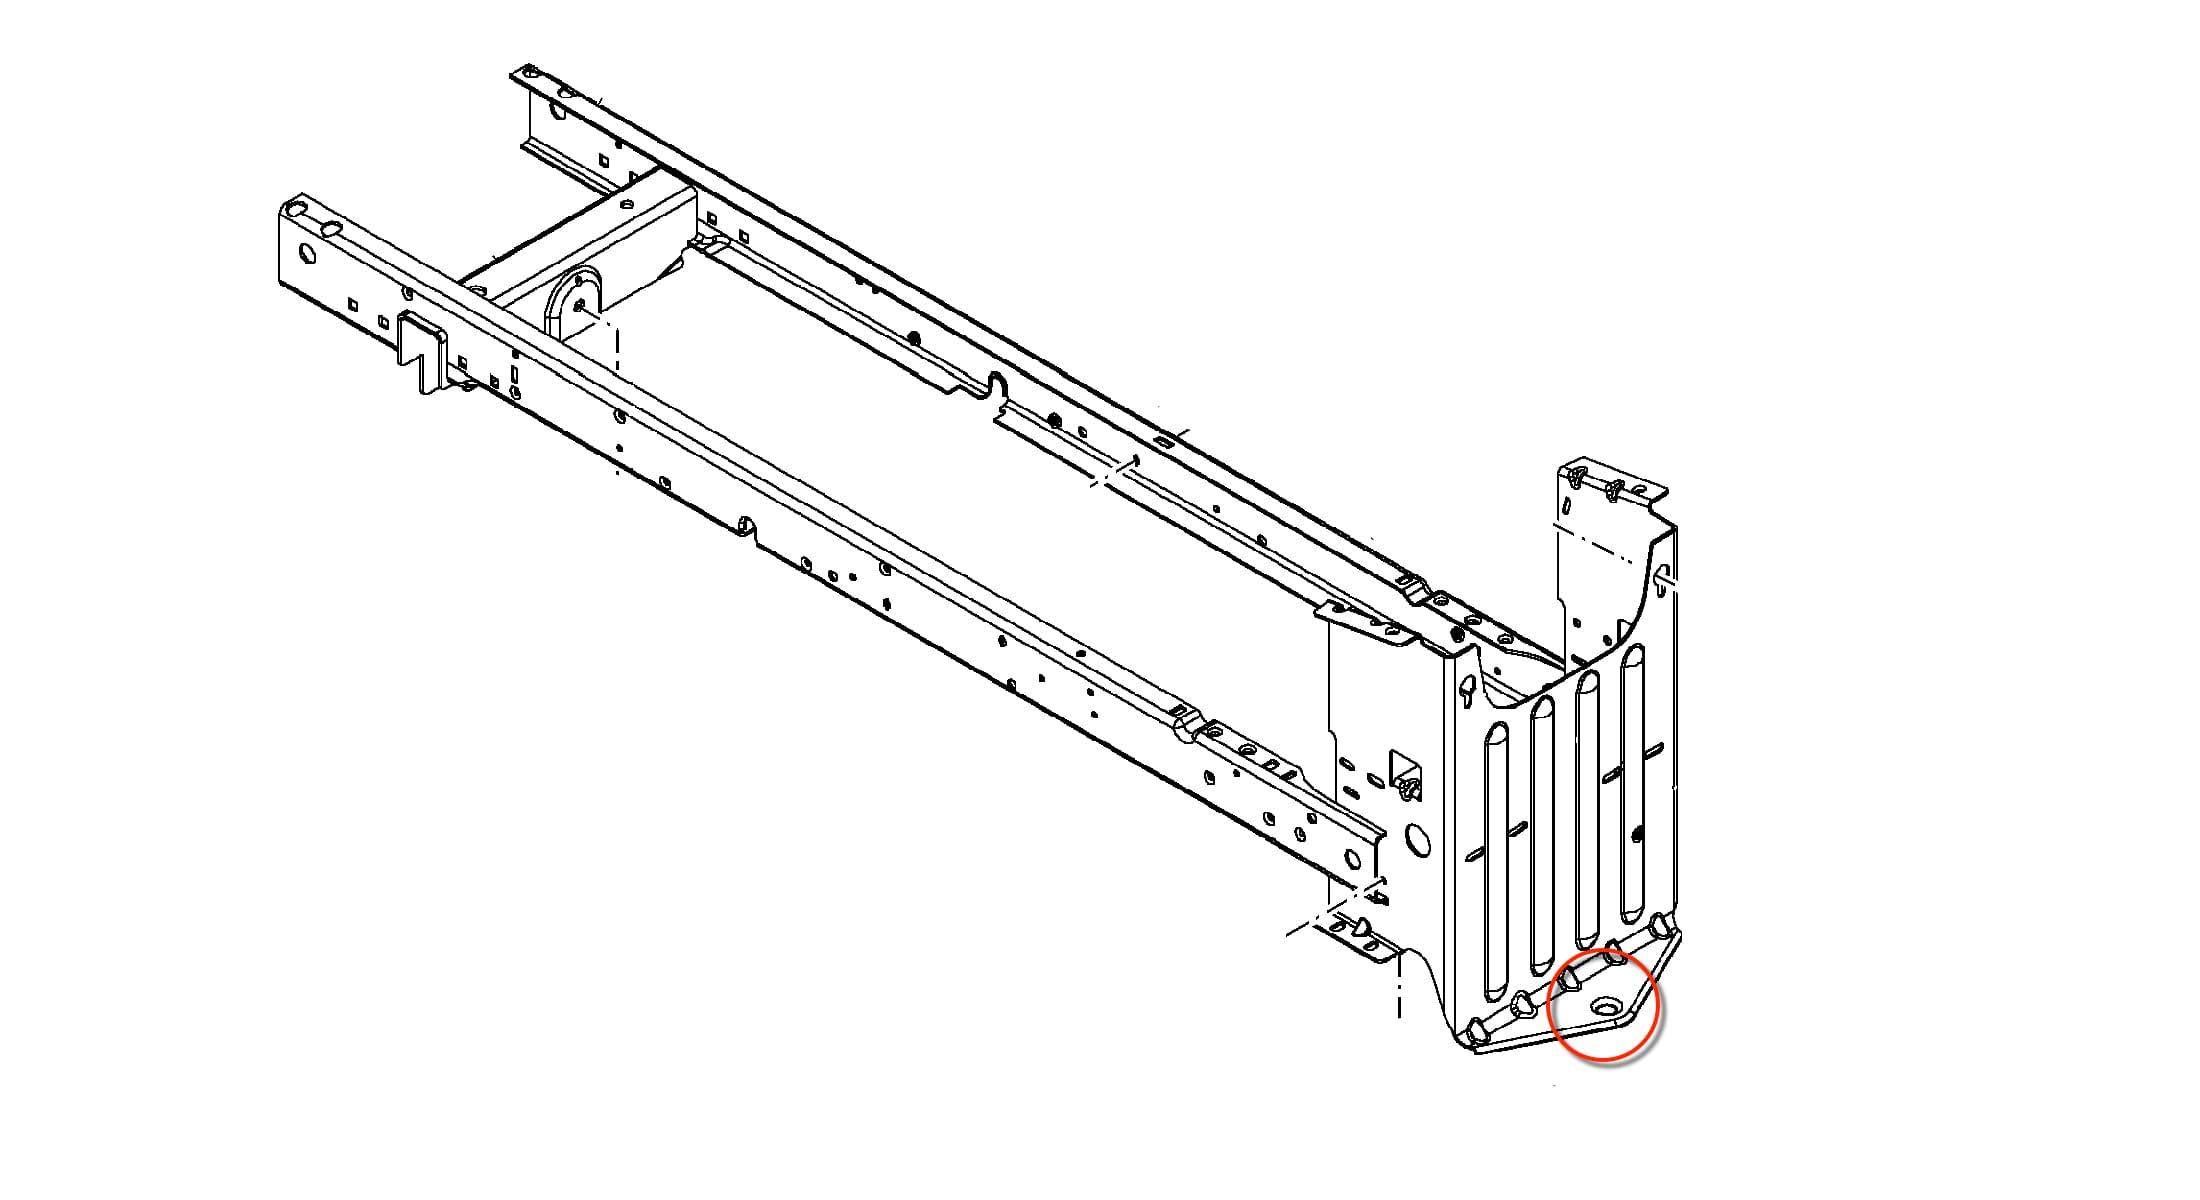 Checkmate Lawn Striper For John Deere Tractor Z445 Wiring Diagram Installation Schematic